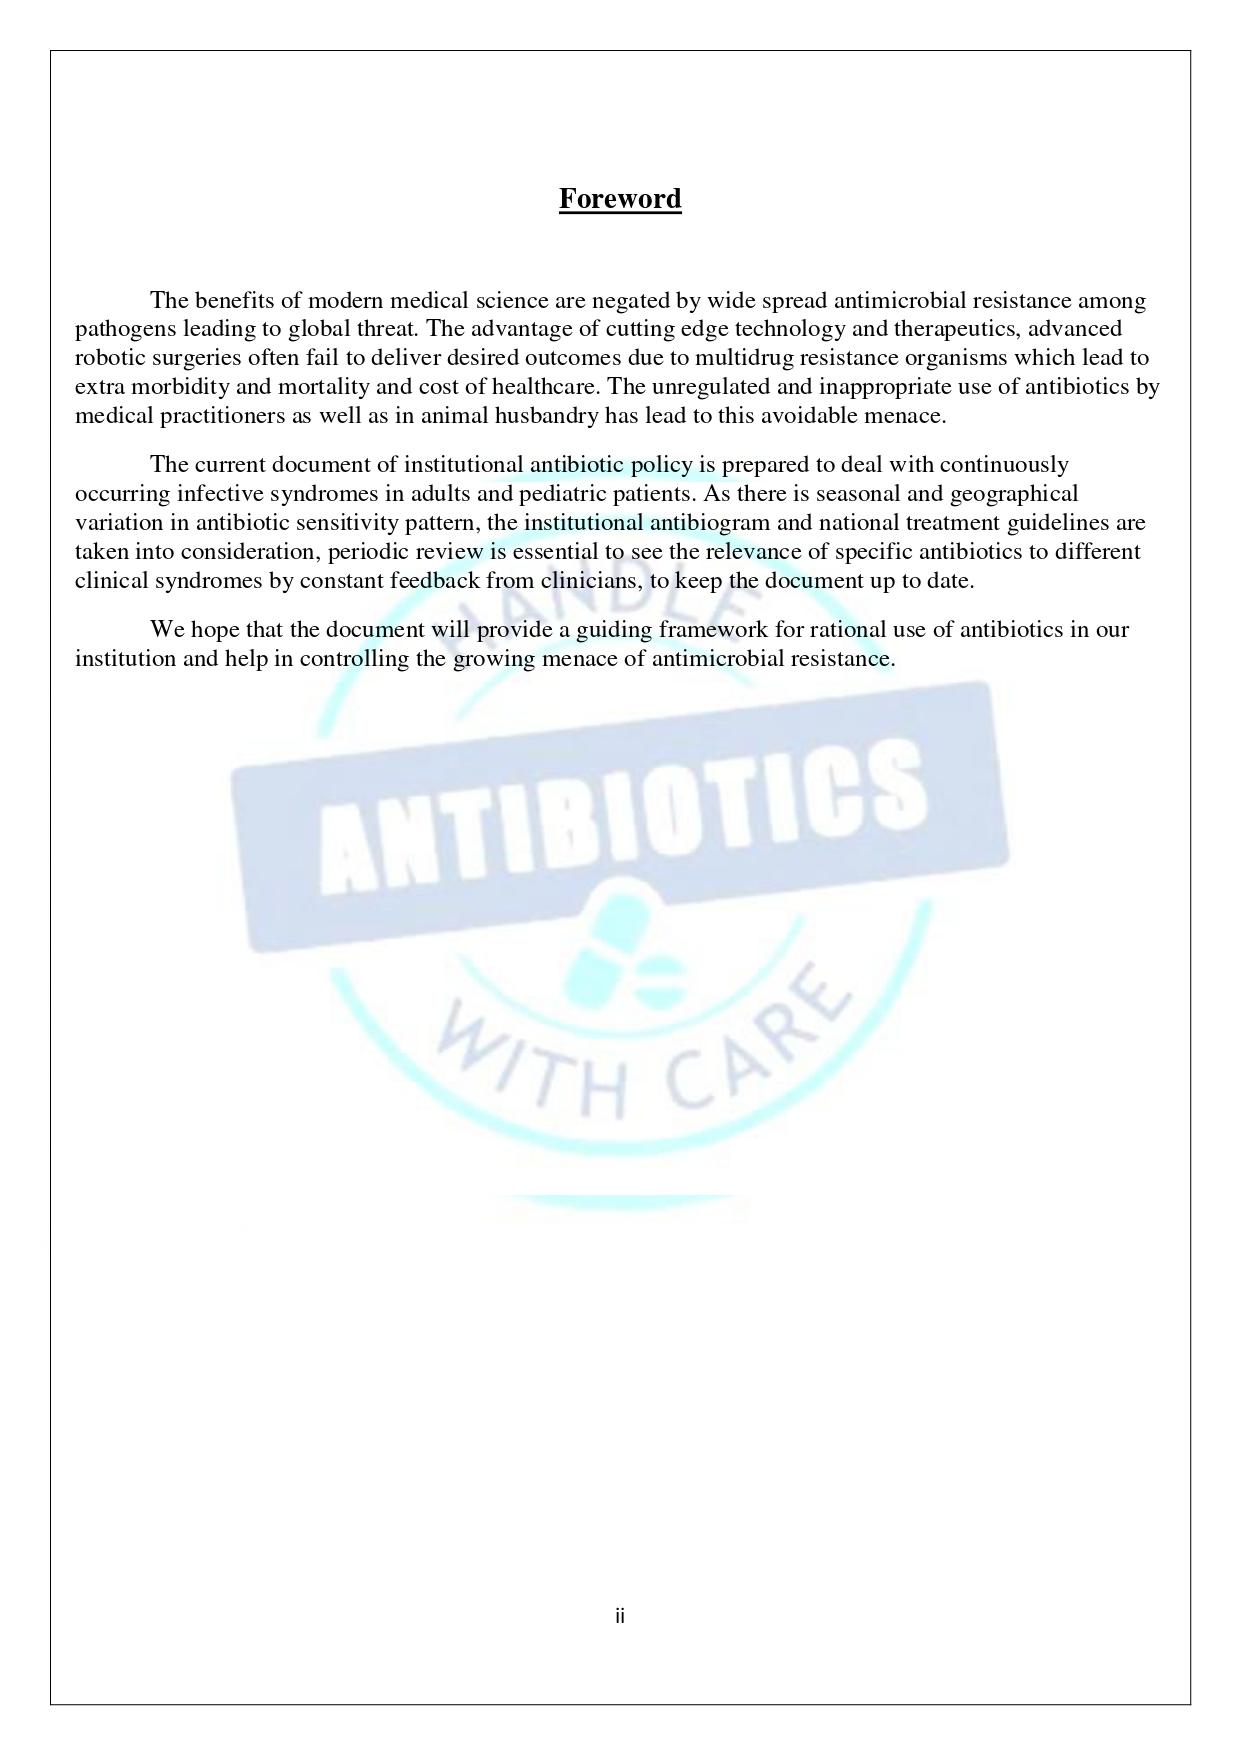 Antibiotic Policy